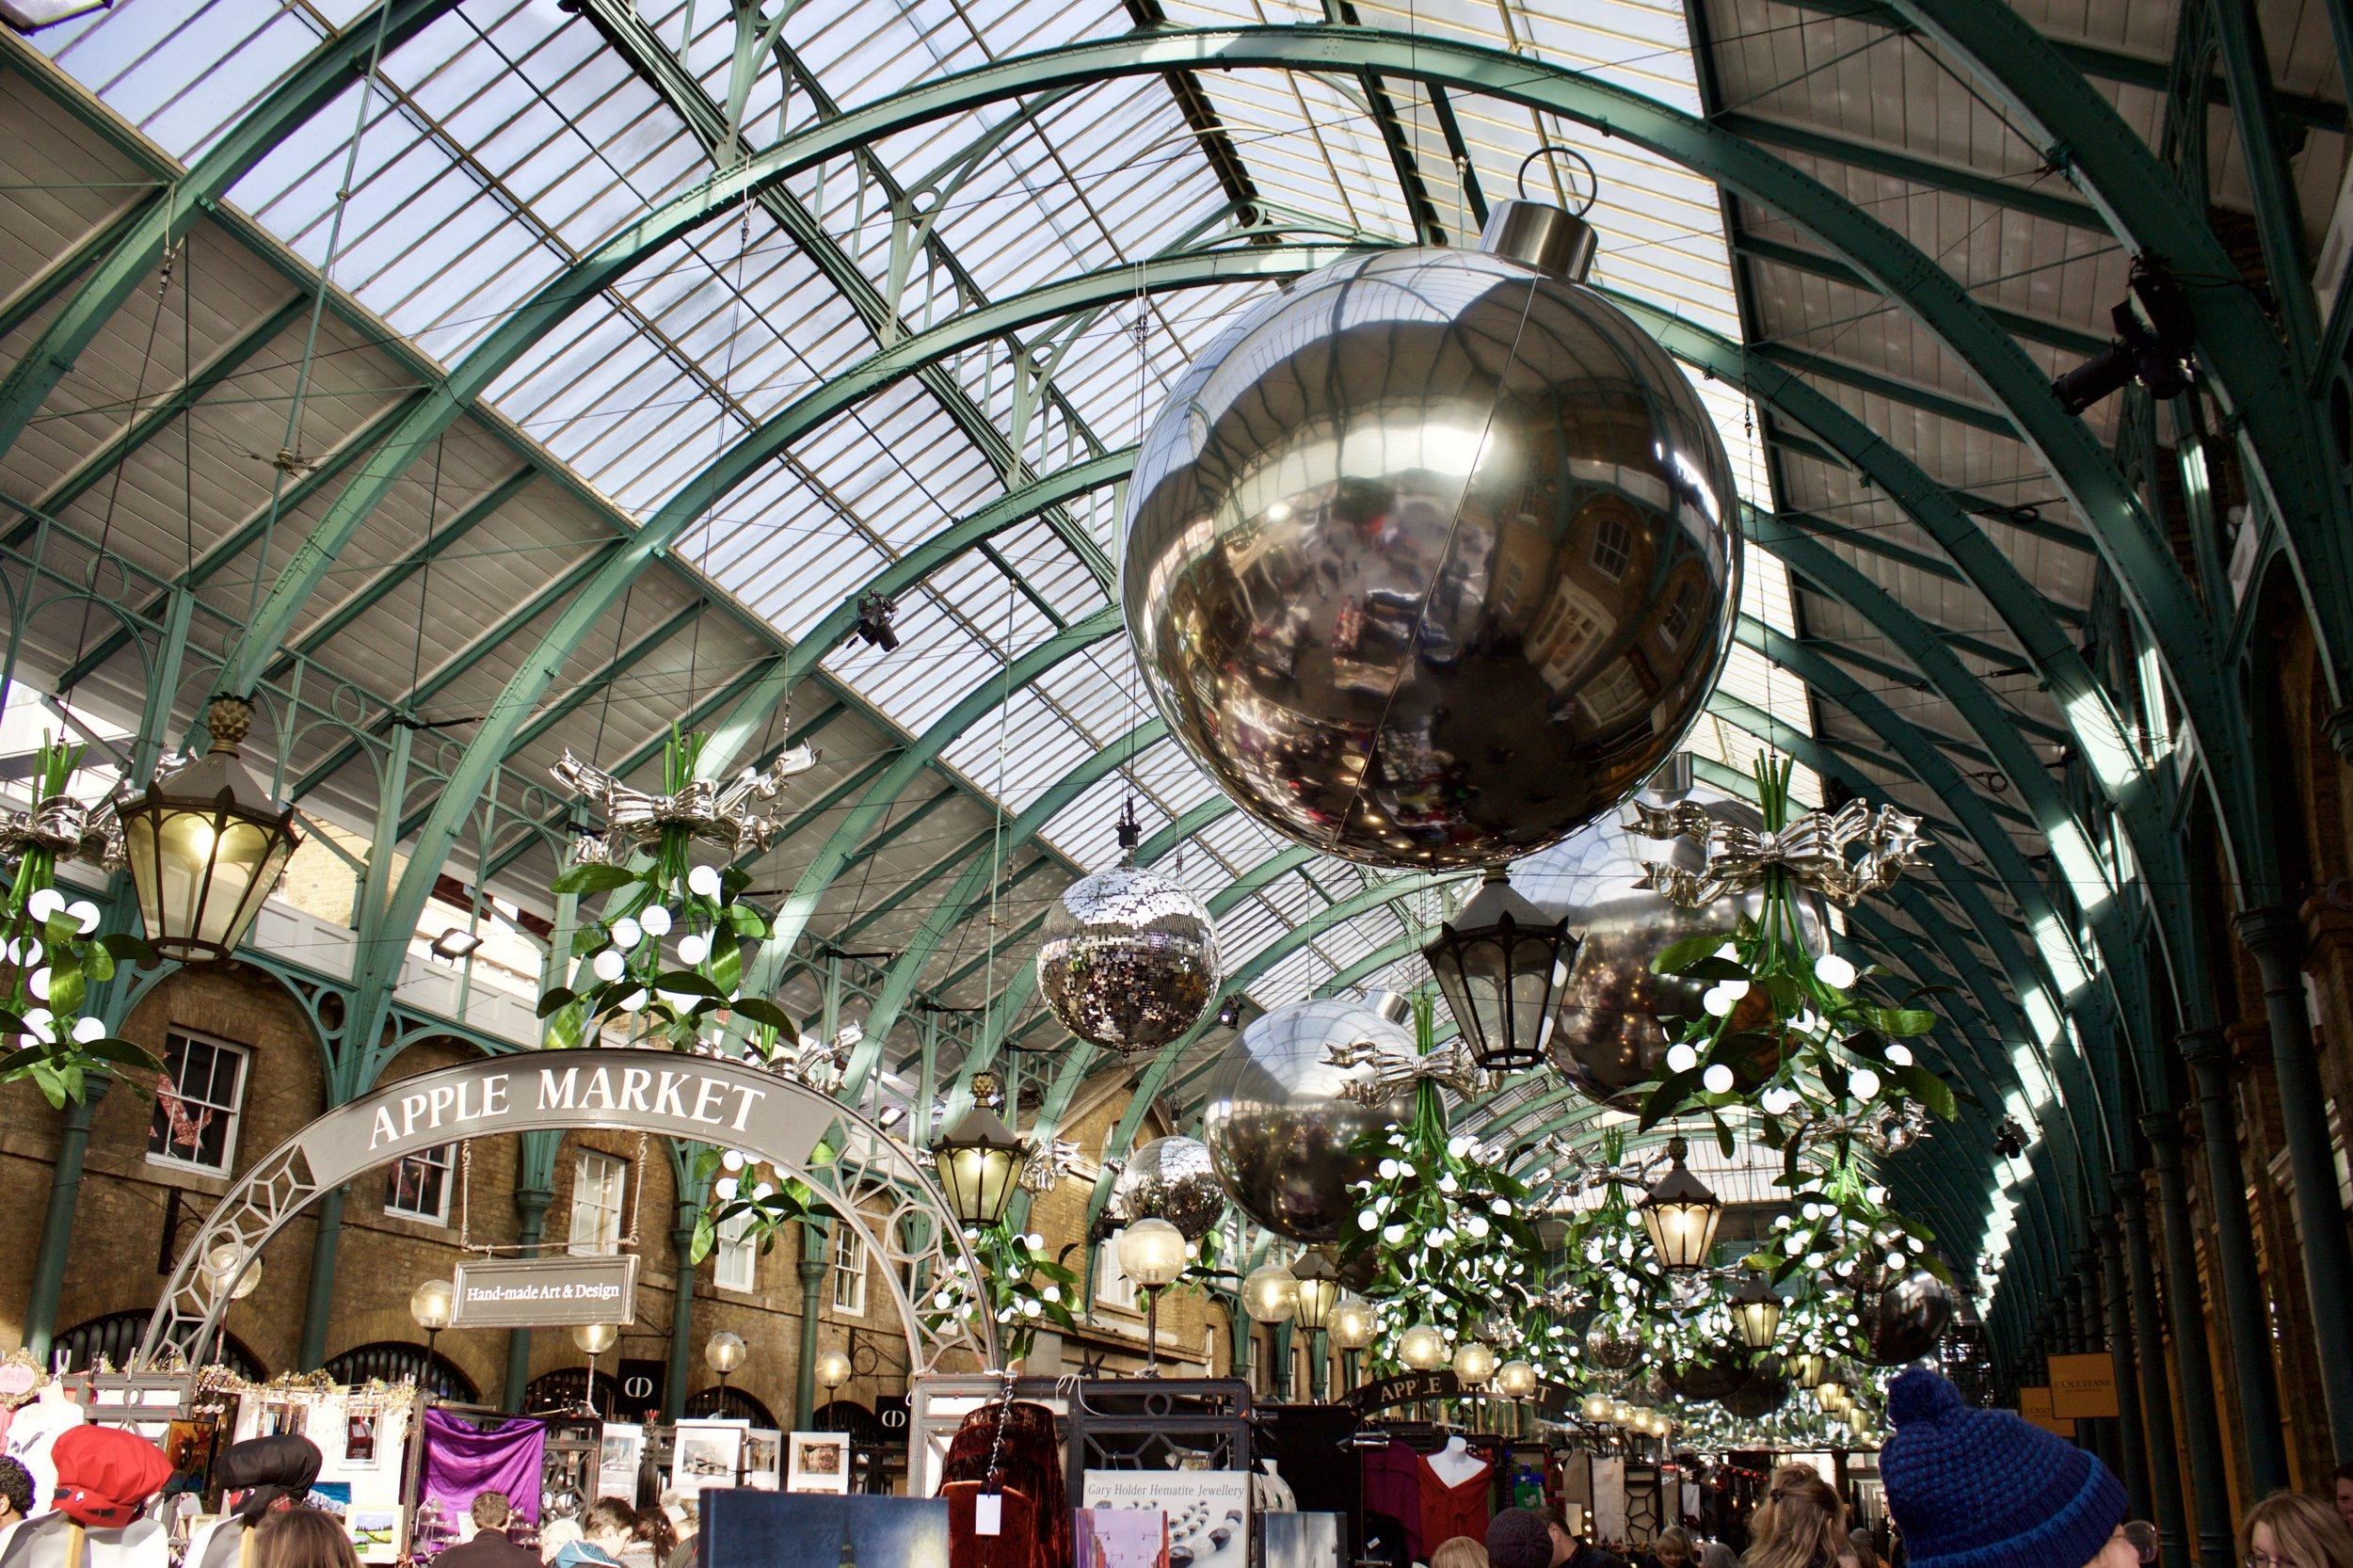 Covent Garden Apple Market // London England // Samantha McNeil